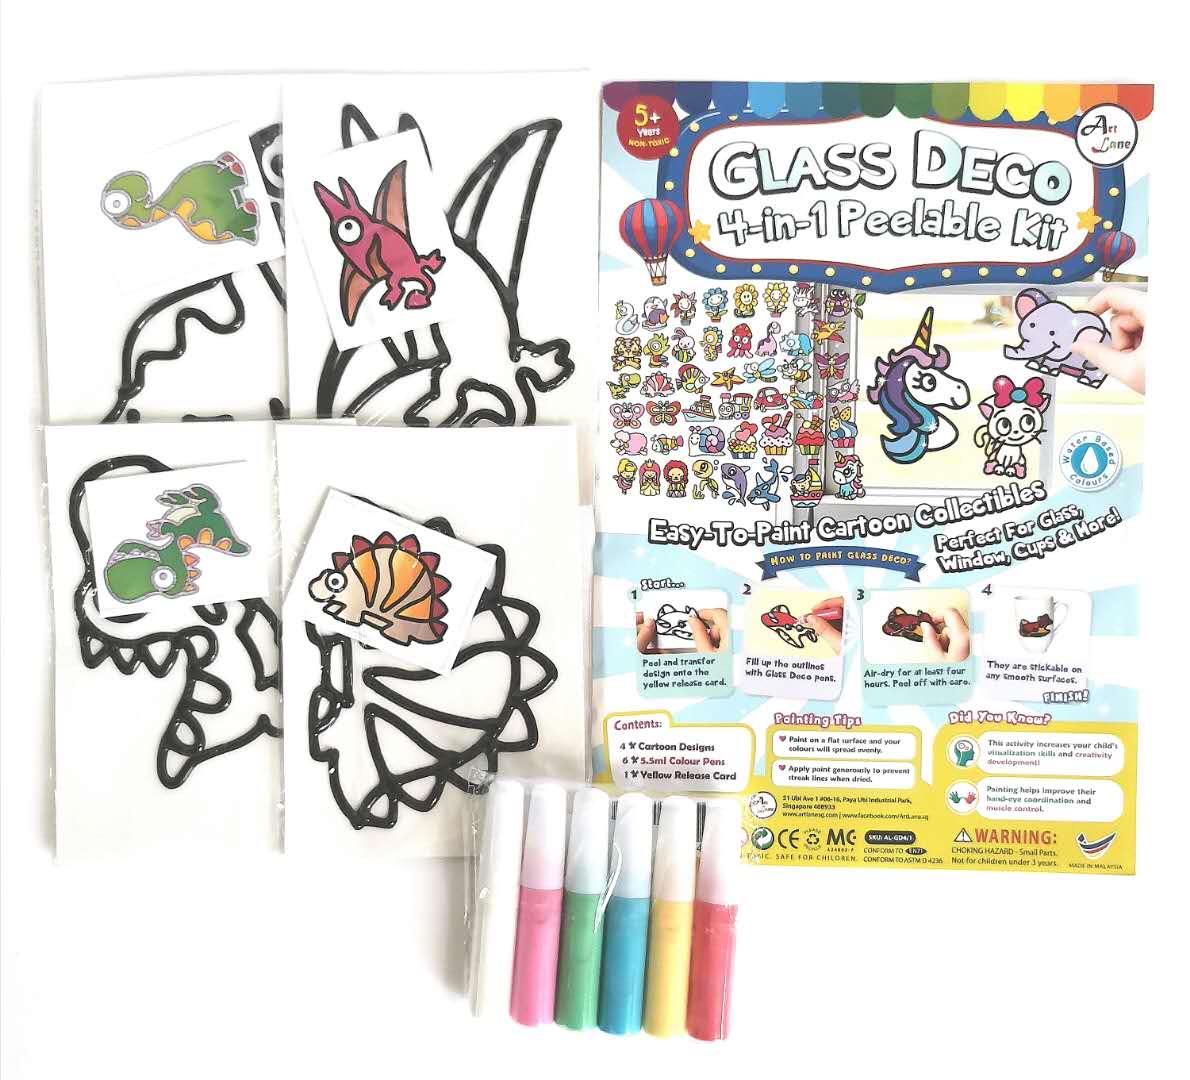 Glass deco set of 4 – 1